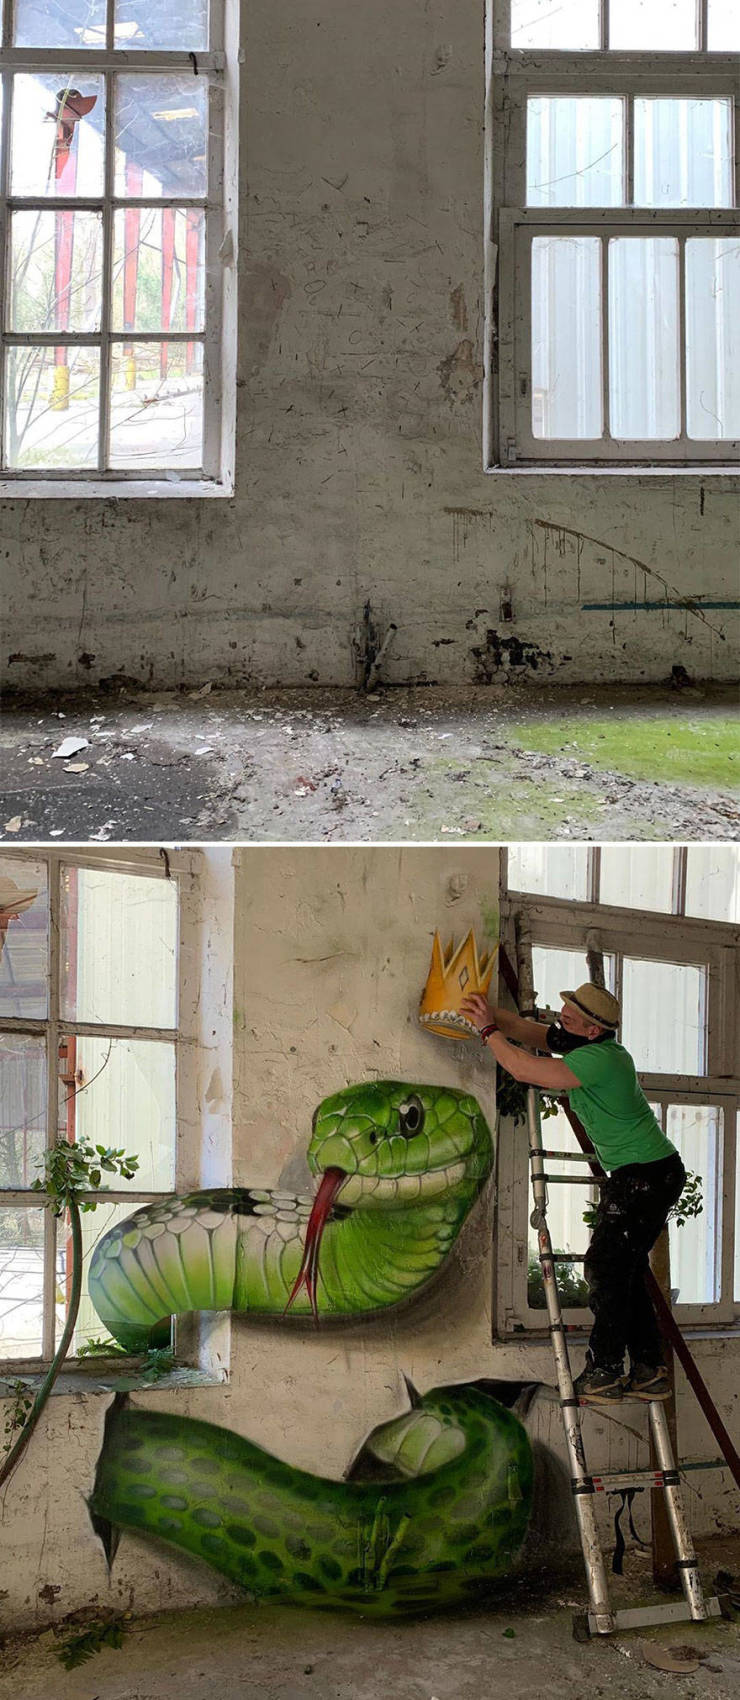 3d street art 4 فن الشارع ثلاثي الابعاد